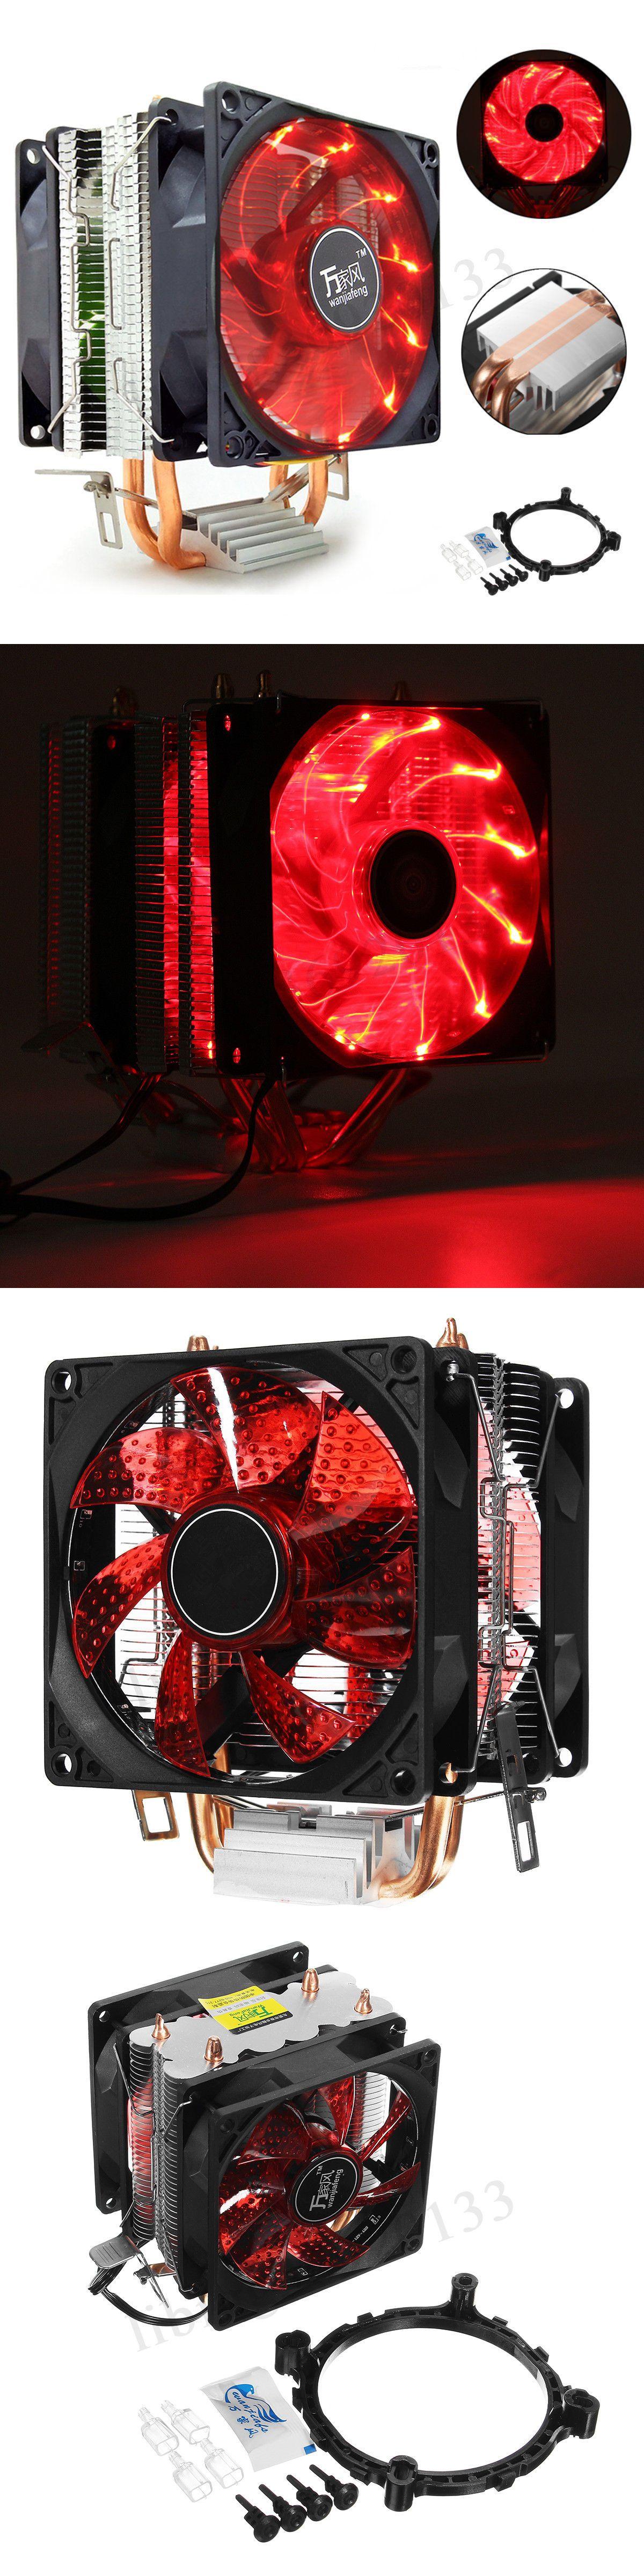 Fans Heat Sinks And Cooling 42000 Cpu Cooler Led Dual Fan Quiet Heatsink For Intel Lga775 1156 Amd Am3 Am4 Ryzen Buy It Now Fans For Sale Graphic Card Ebay